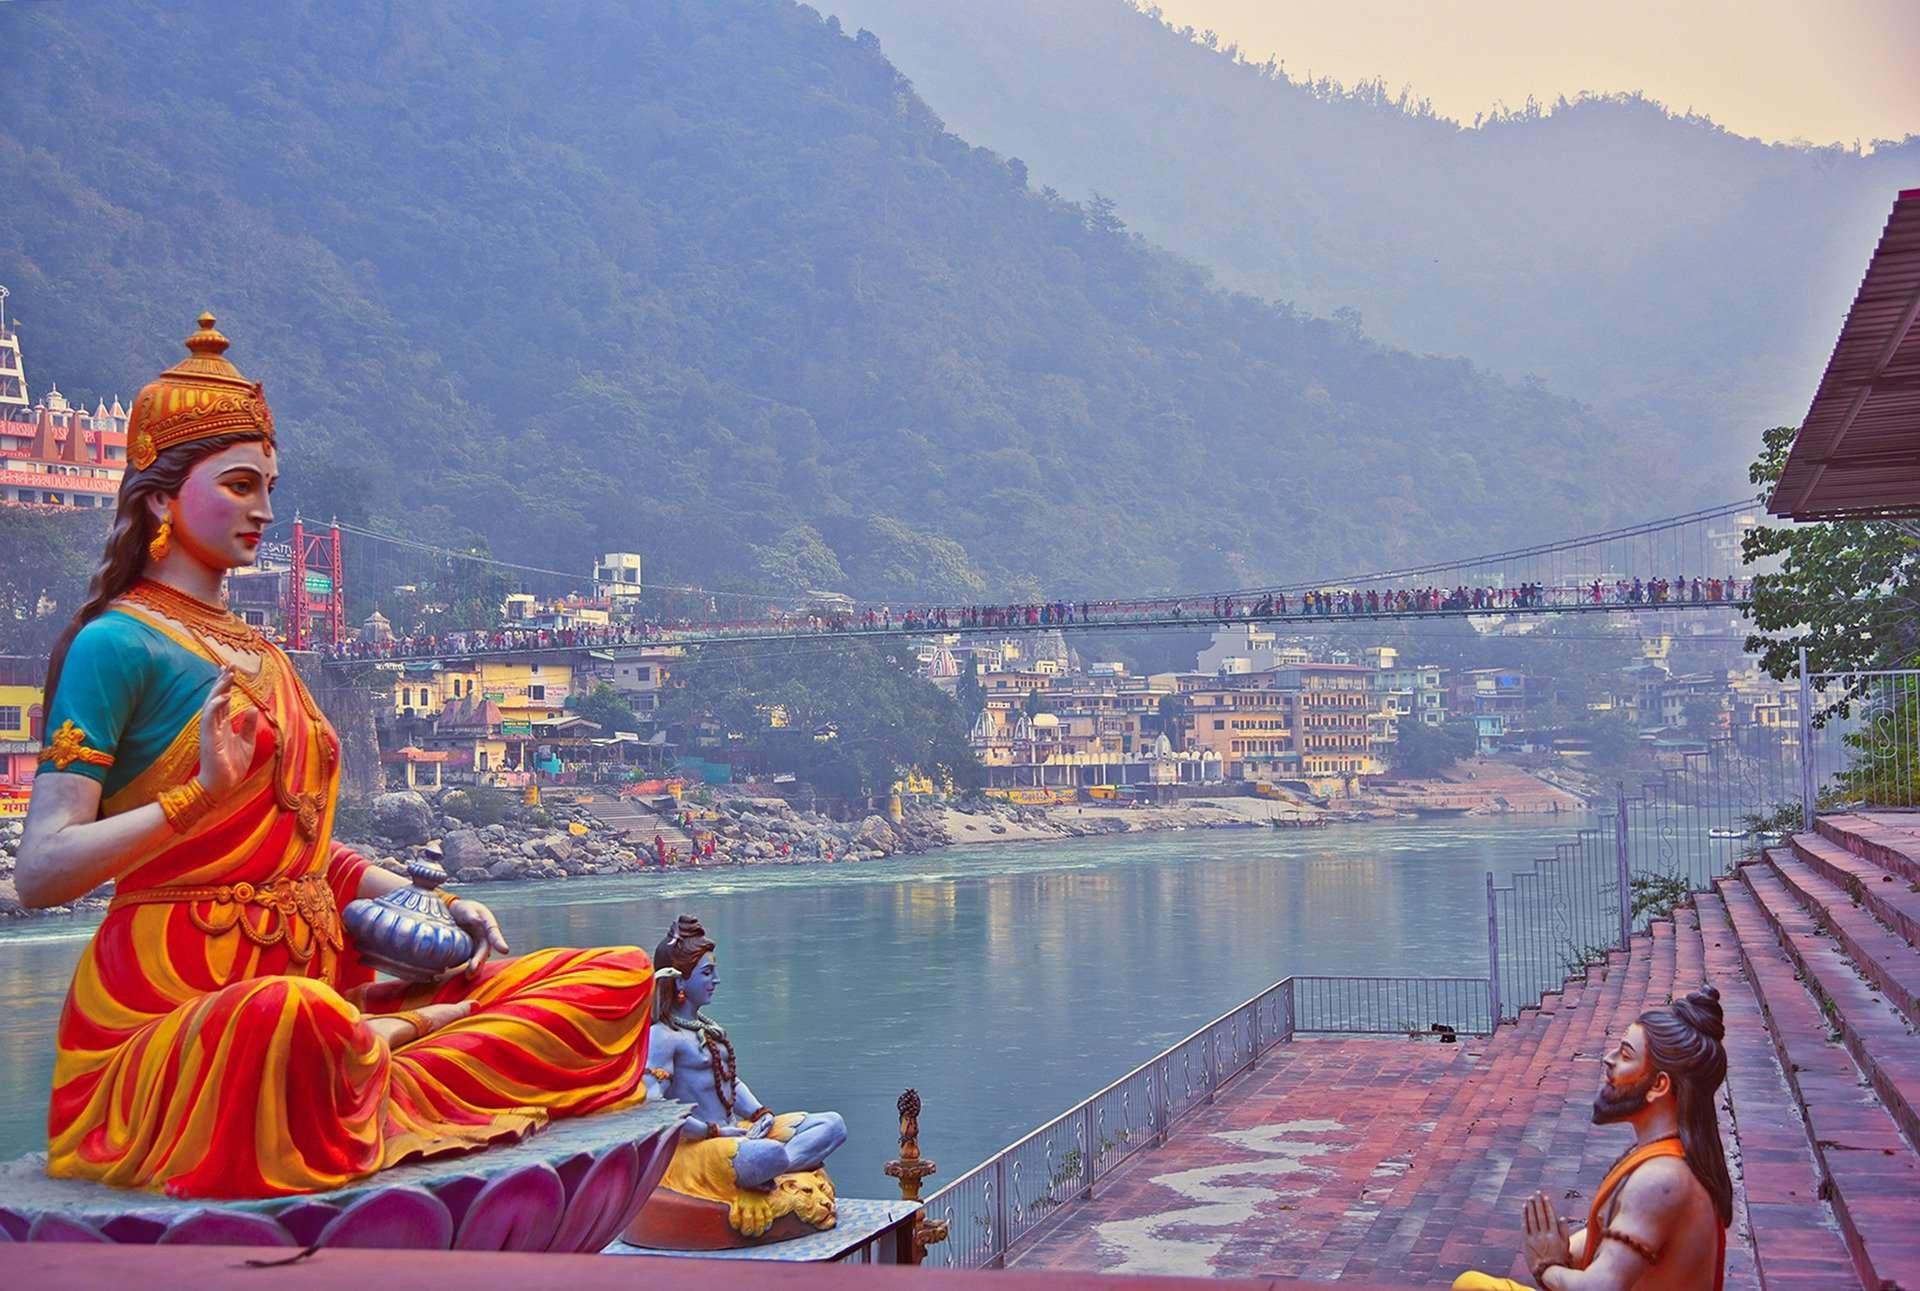 Uttarakhand Tourism Development Board: Tourist Incentive Coupon Scheme: A step to attract tourism in Uttarakhand, Travel News, ET TravelWorld